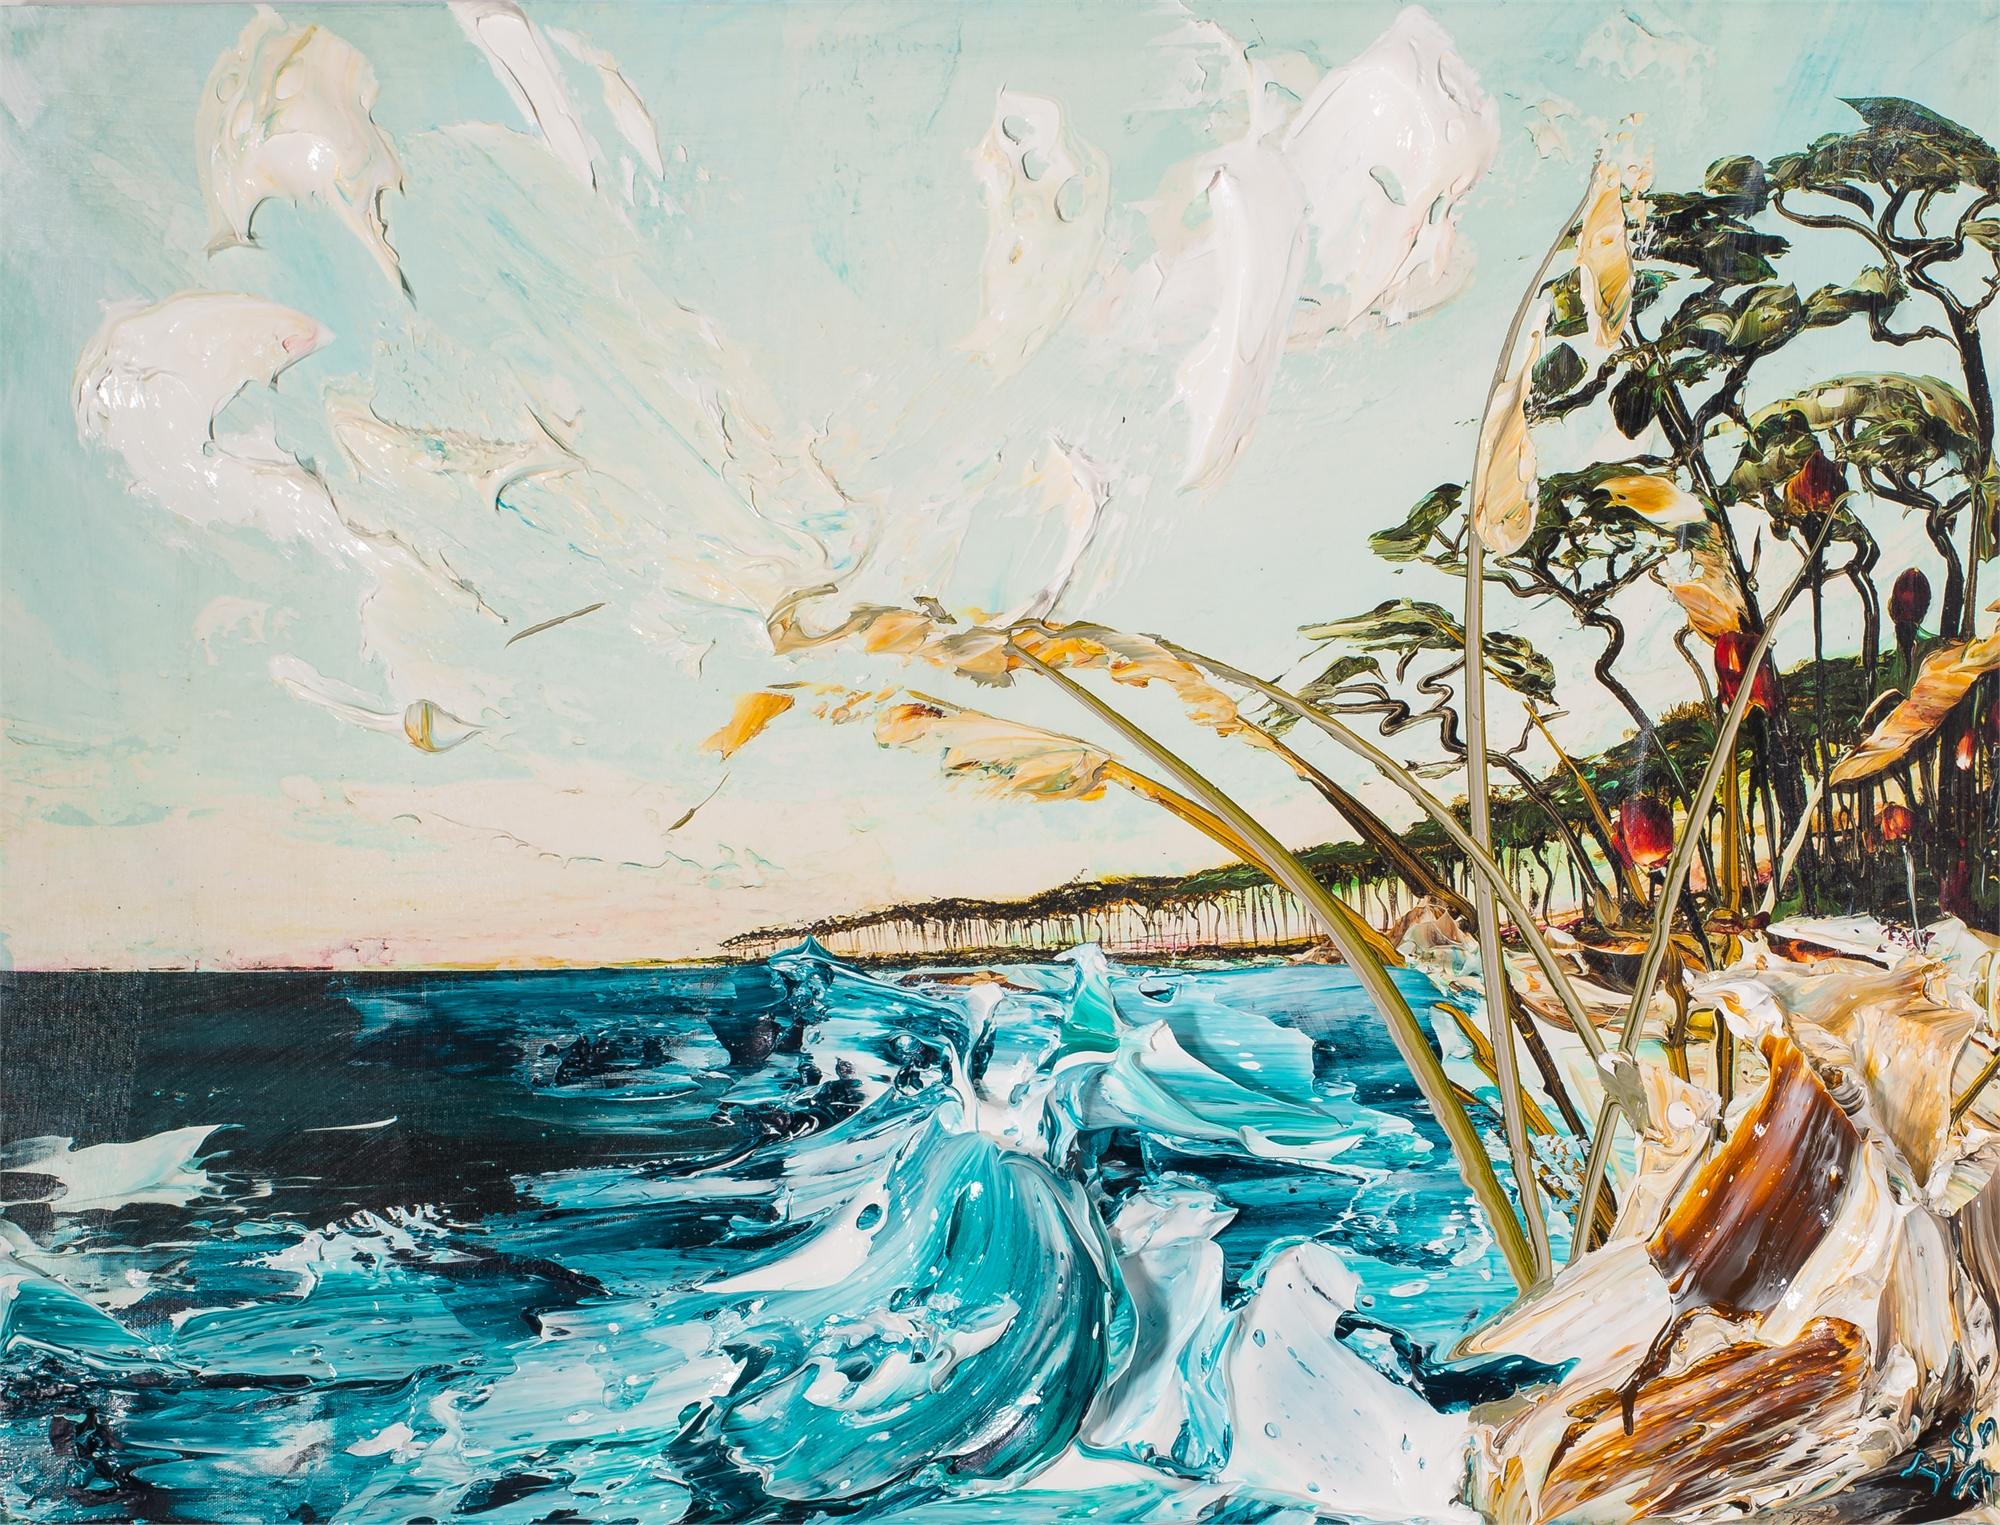 SEASCAPE HPAE 11/50 by Justin Gaffrey